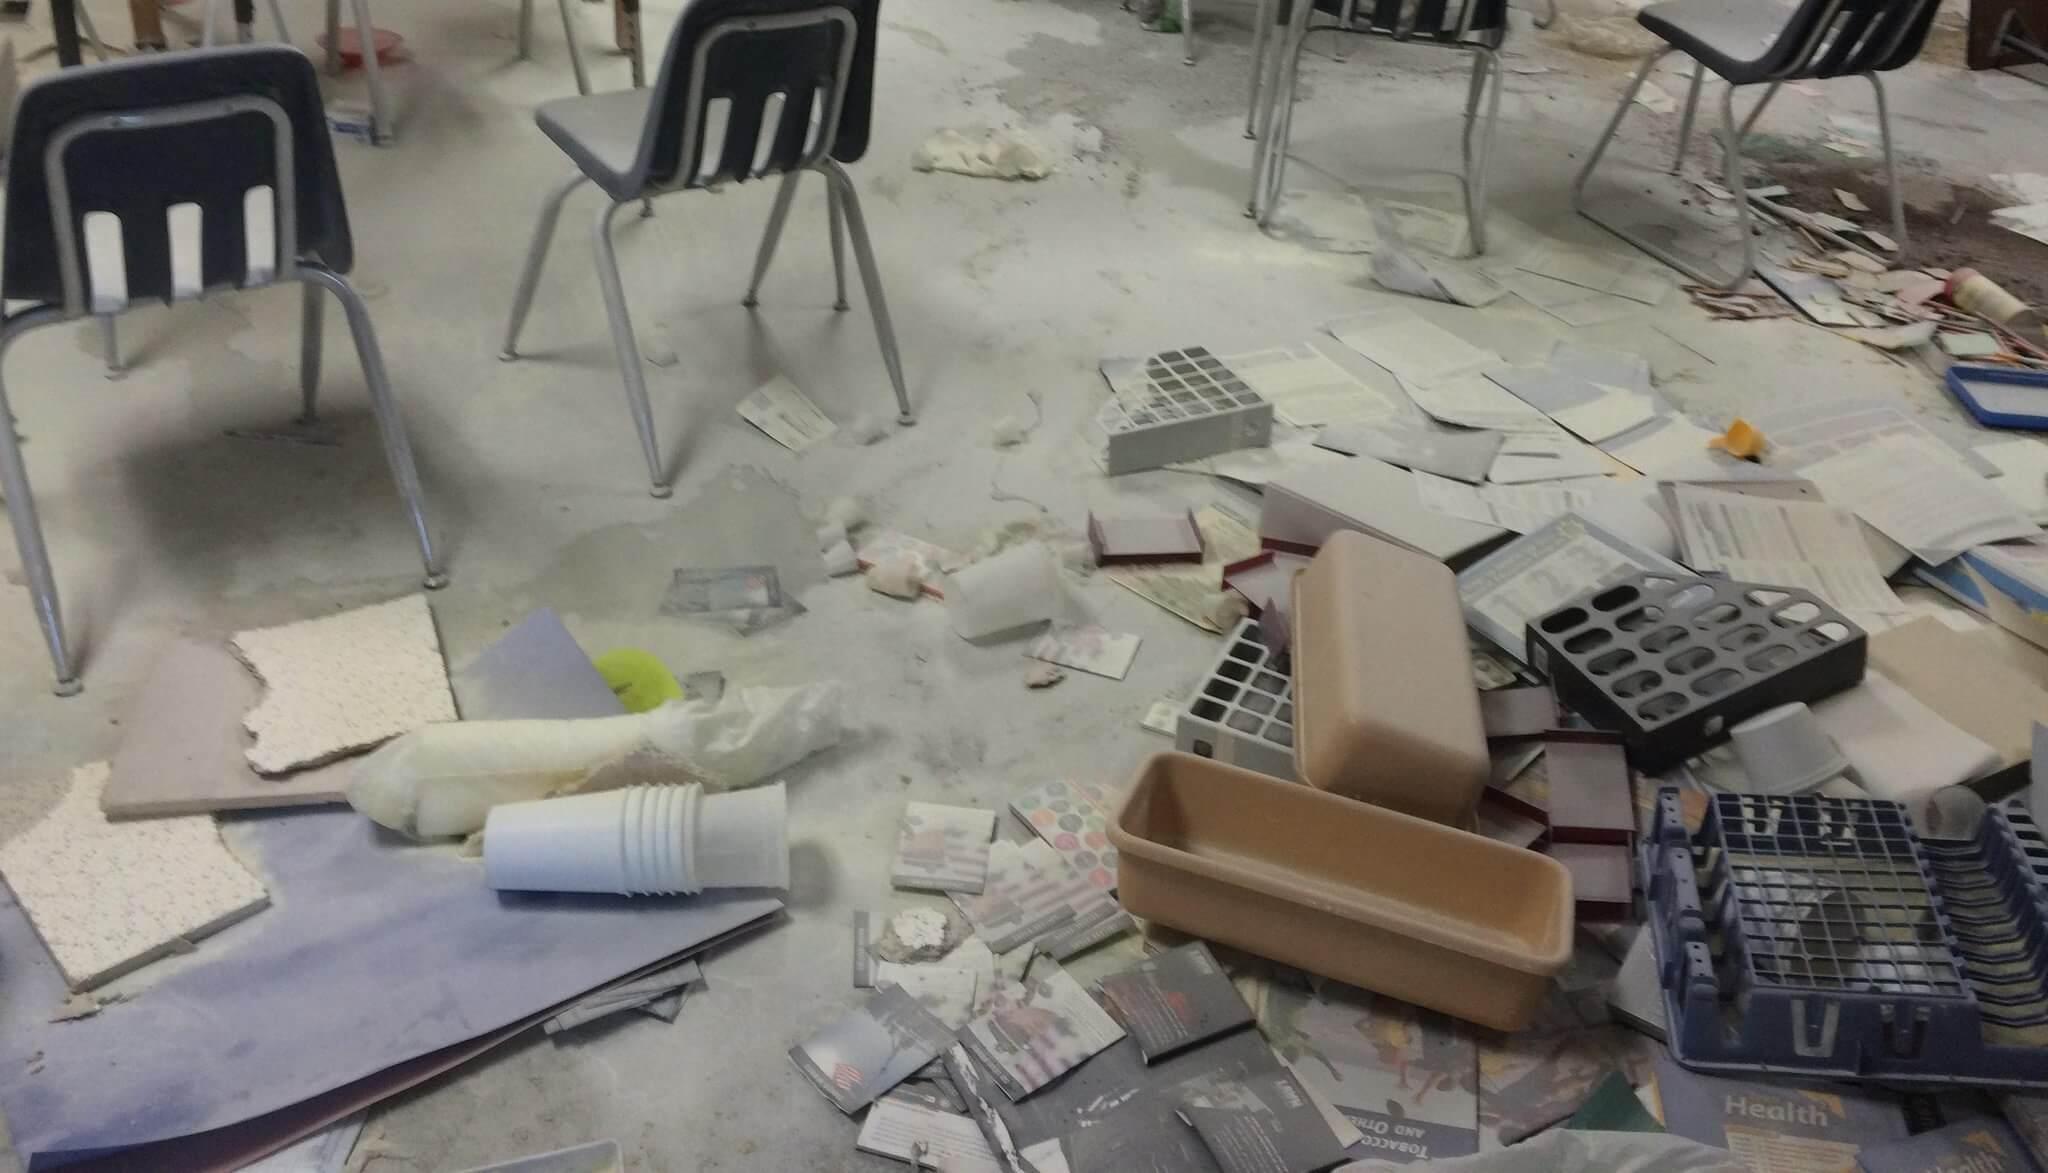 Irate mob vandalizes G D Nursing Home